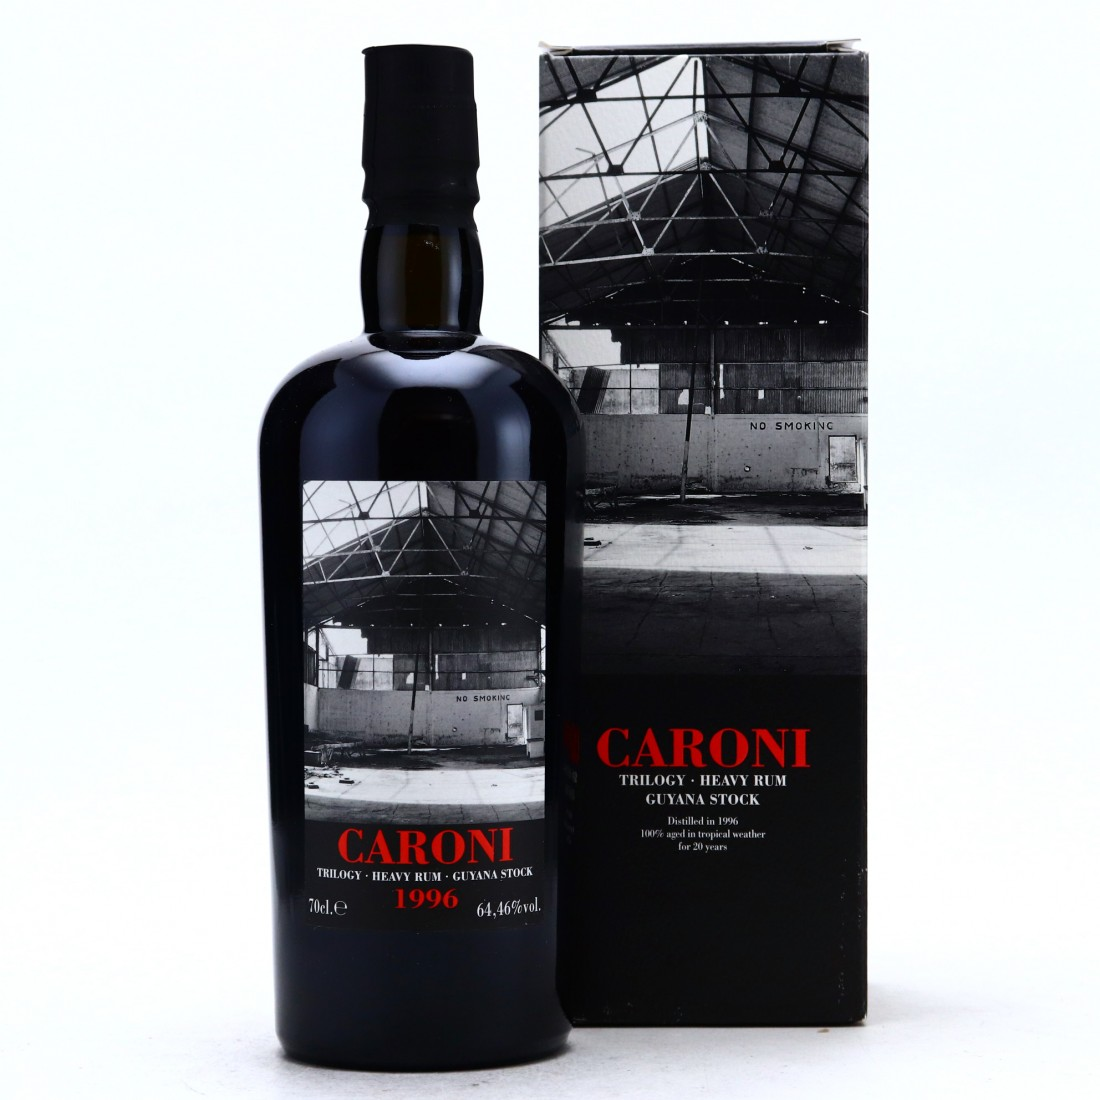 Caroni 1996 Velier 20 Year Old Guyana Stock Single Cask #5602 / LMDW Trilogy